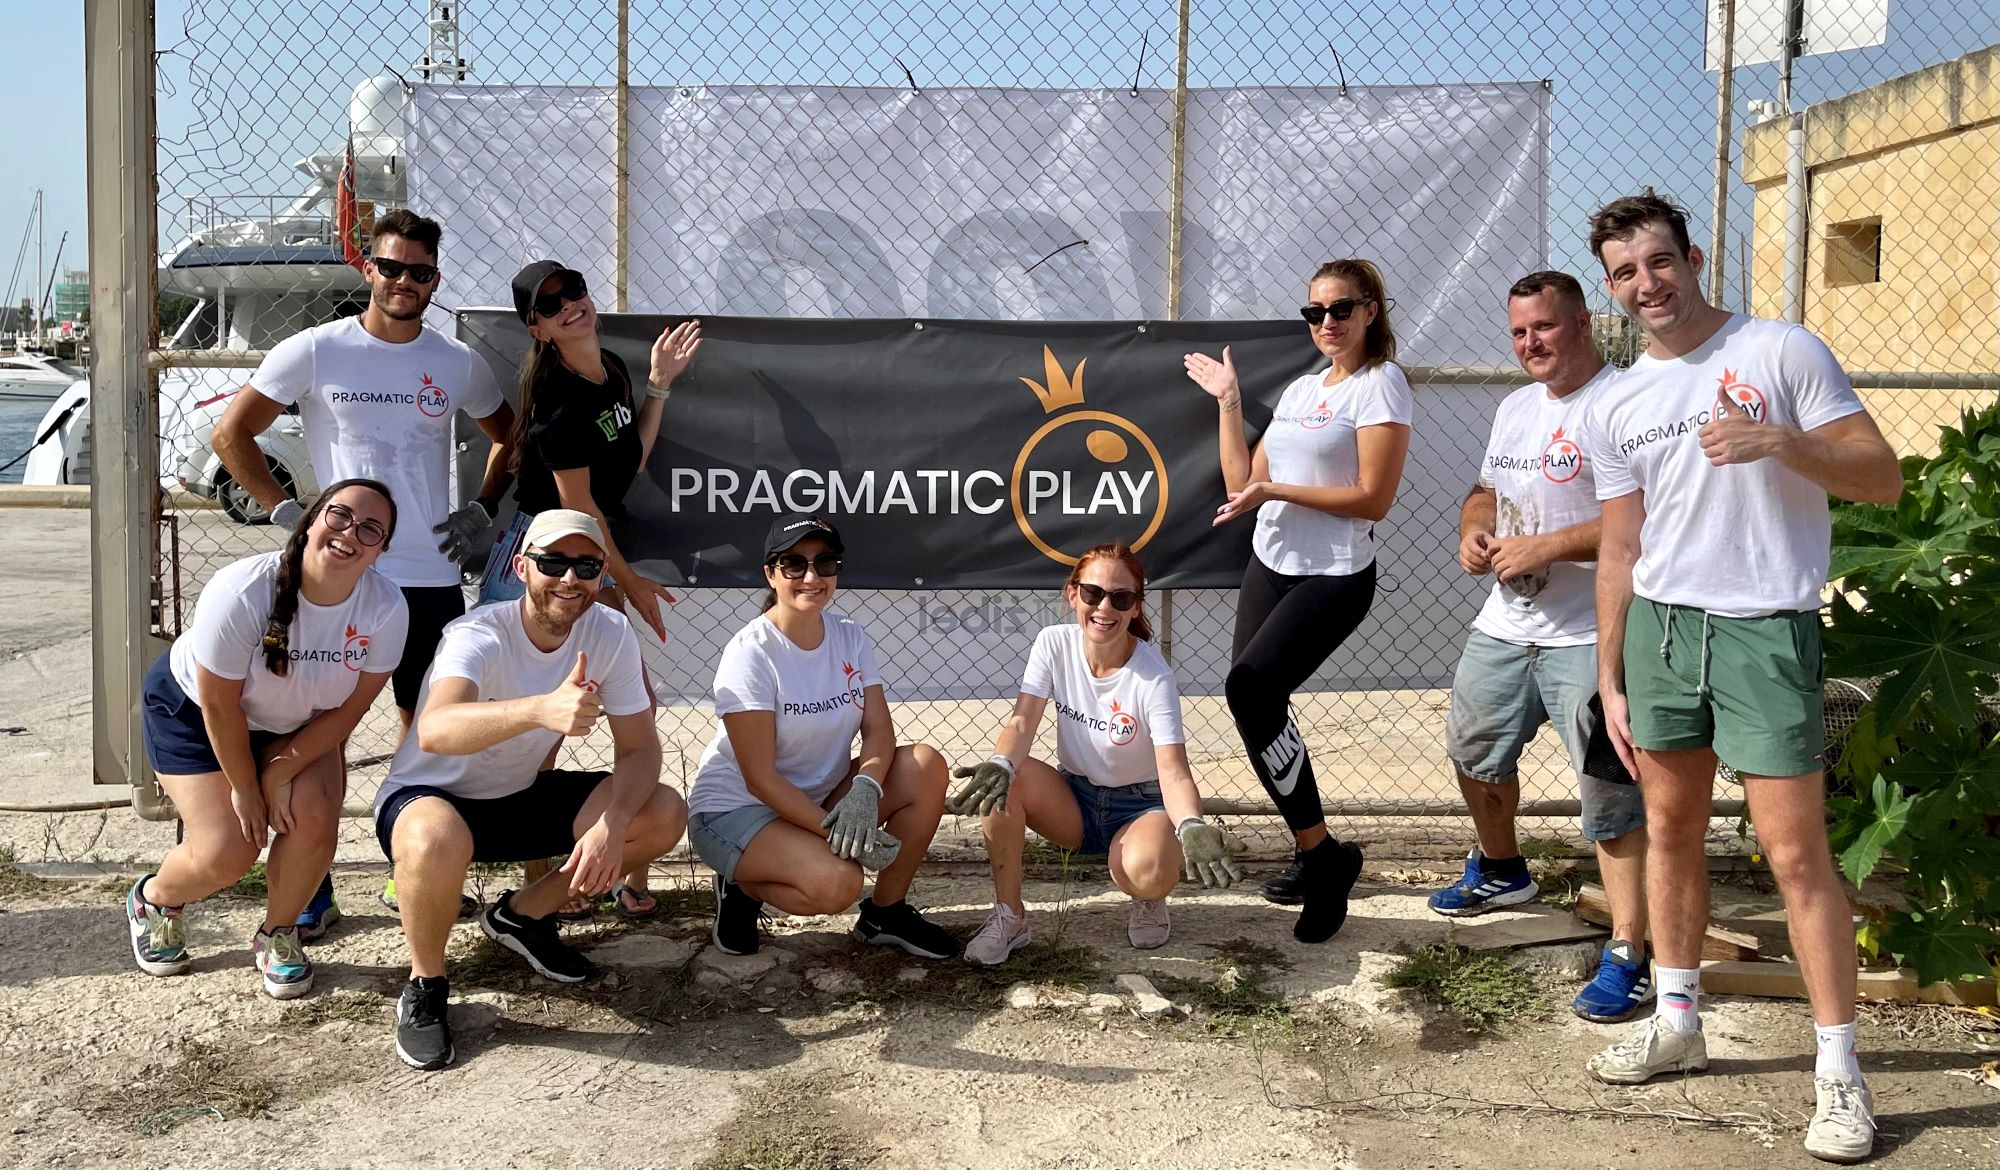 Pragmatic Play donates €12,000 towards eco-friendly causes in Malta